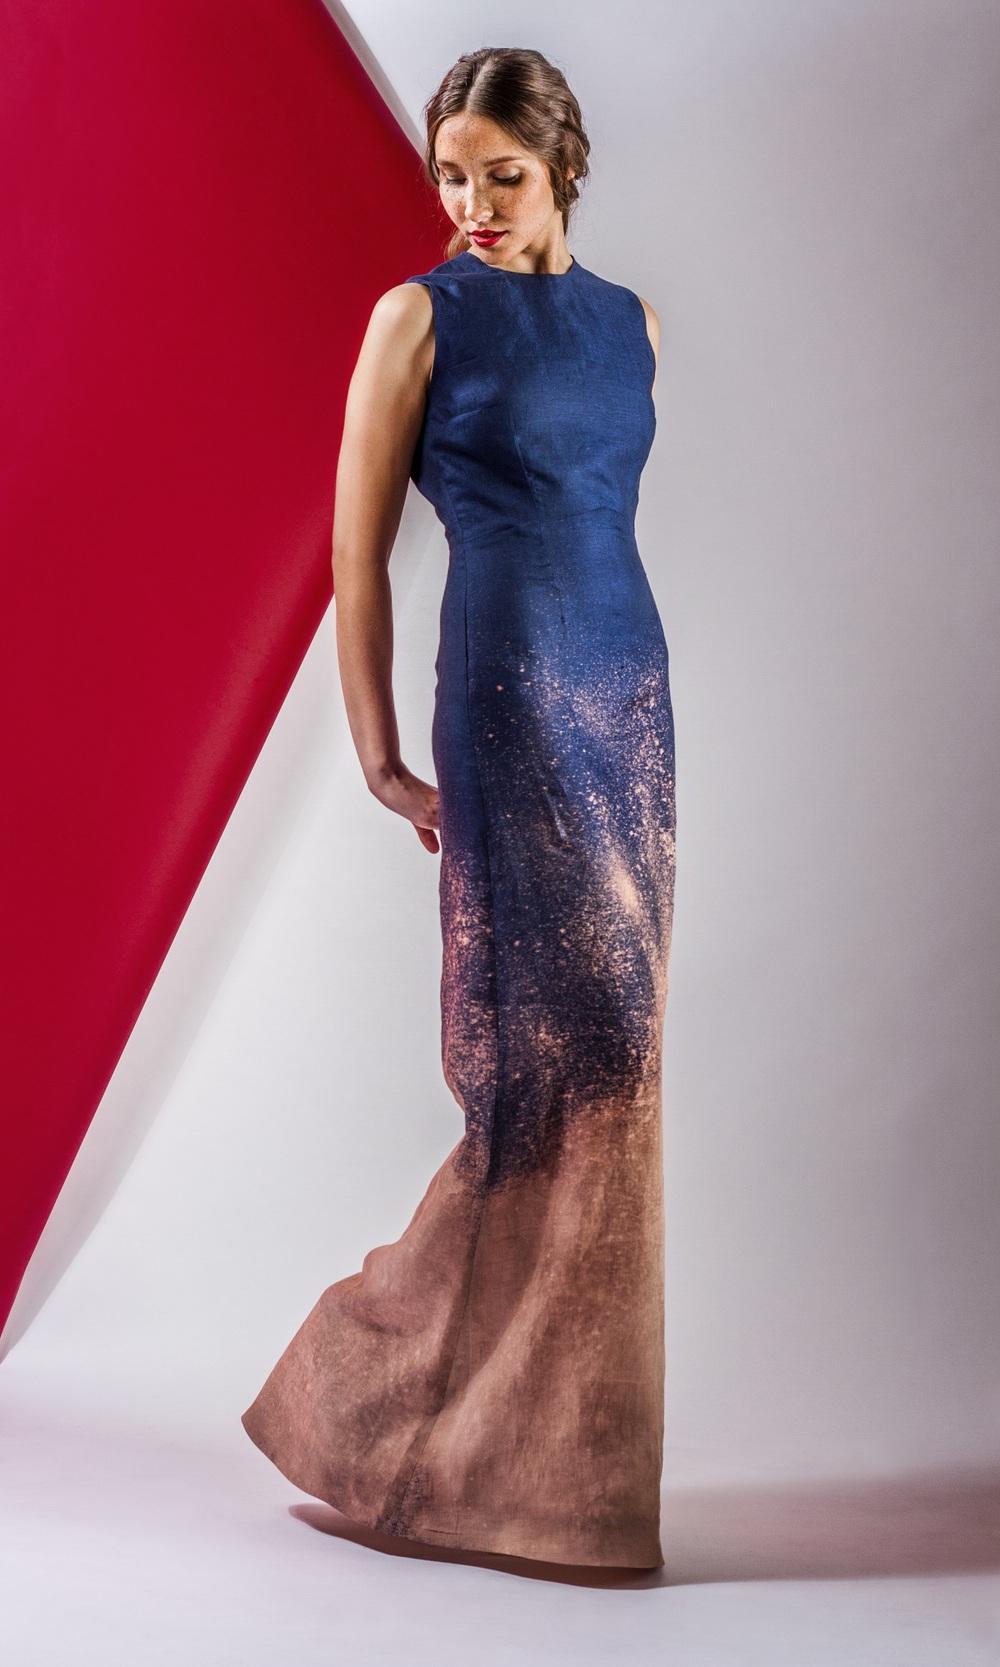 Maratott maxi ruha: 19.800 Ft